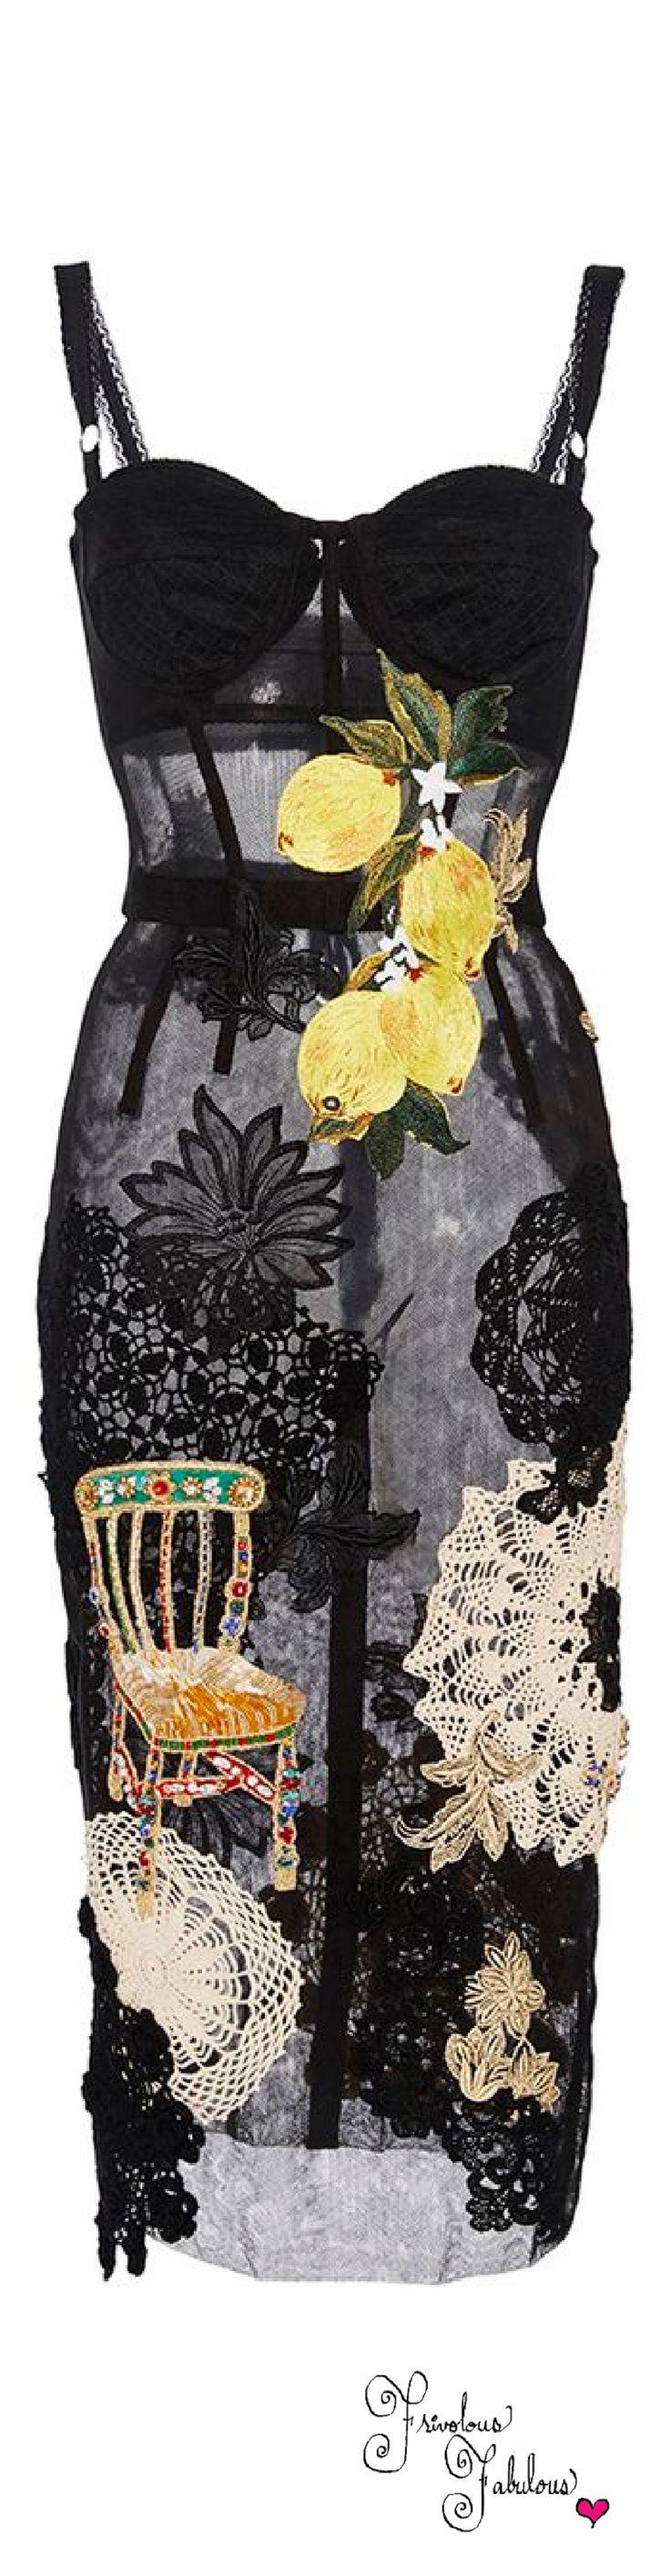 Frivolous Fabulous - Dolce & Gabbana Lemon Embroidered Stretch Tulle Sheath Dress Spring Summer 2016